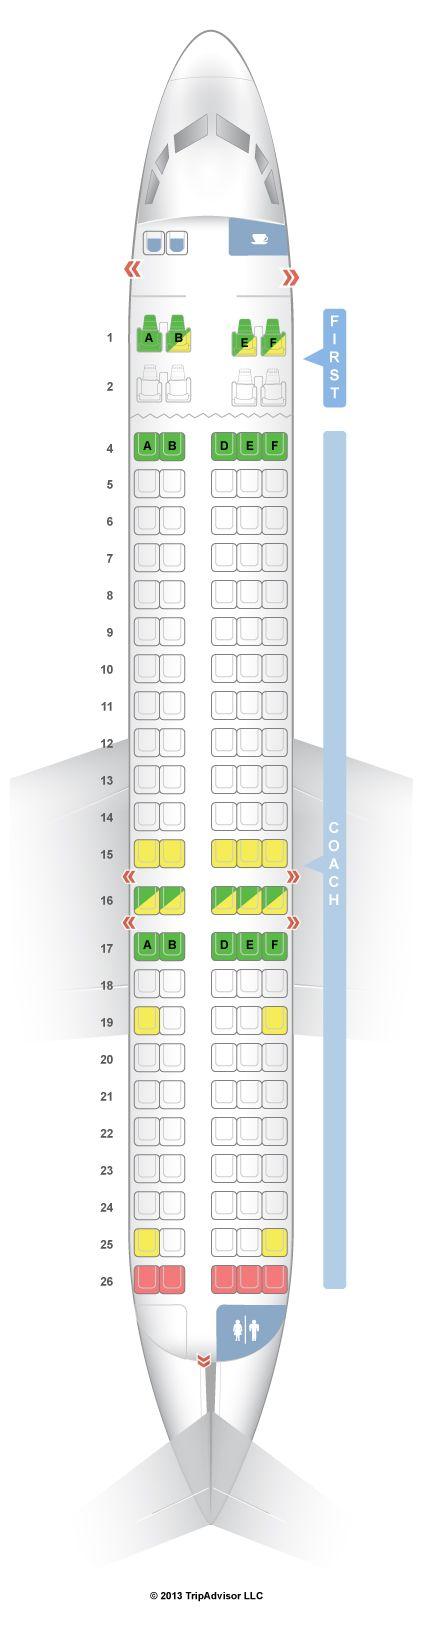 Seatguru Seat Map Hawaiian Airlines Boeing 717 200 717 Hawaiian Airlines Seatguru Airlines